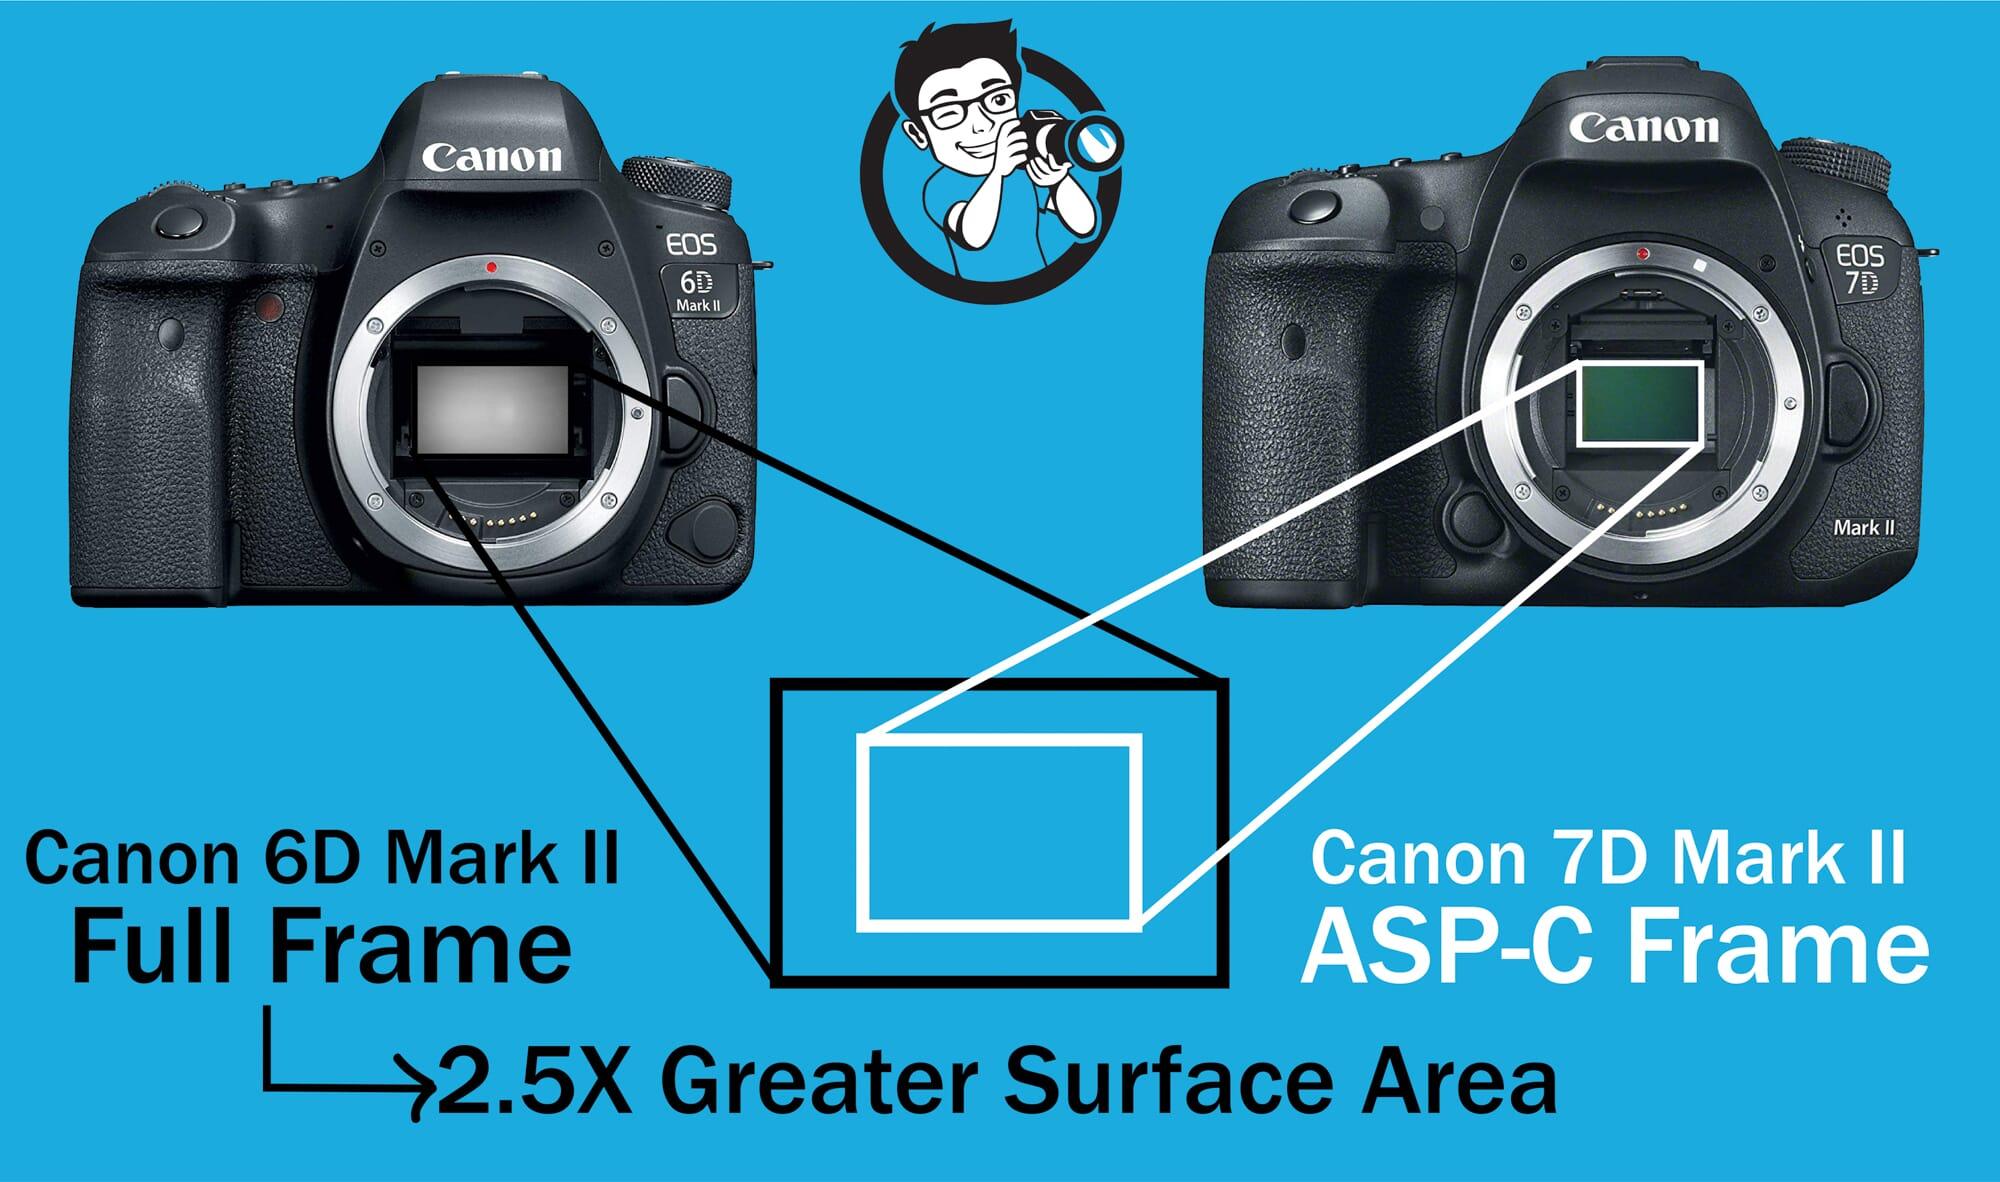 Sensor Canon 6D vs 7D